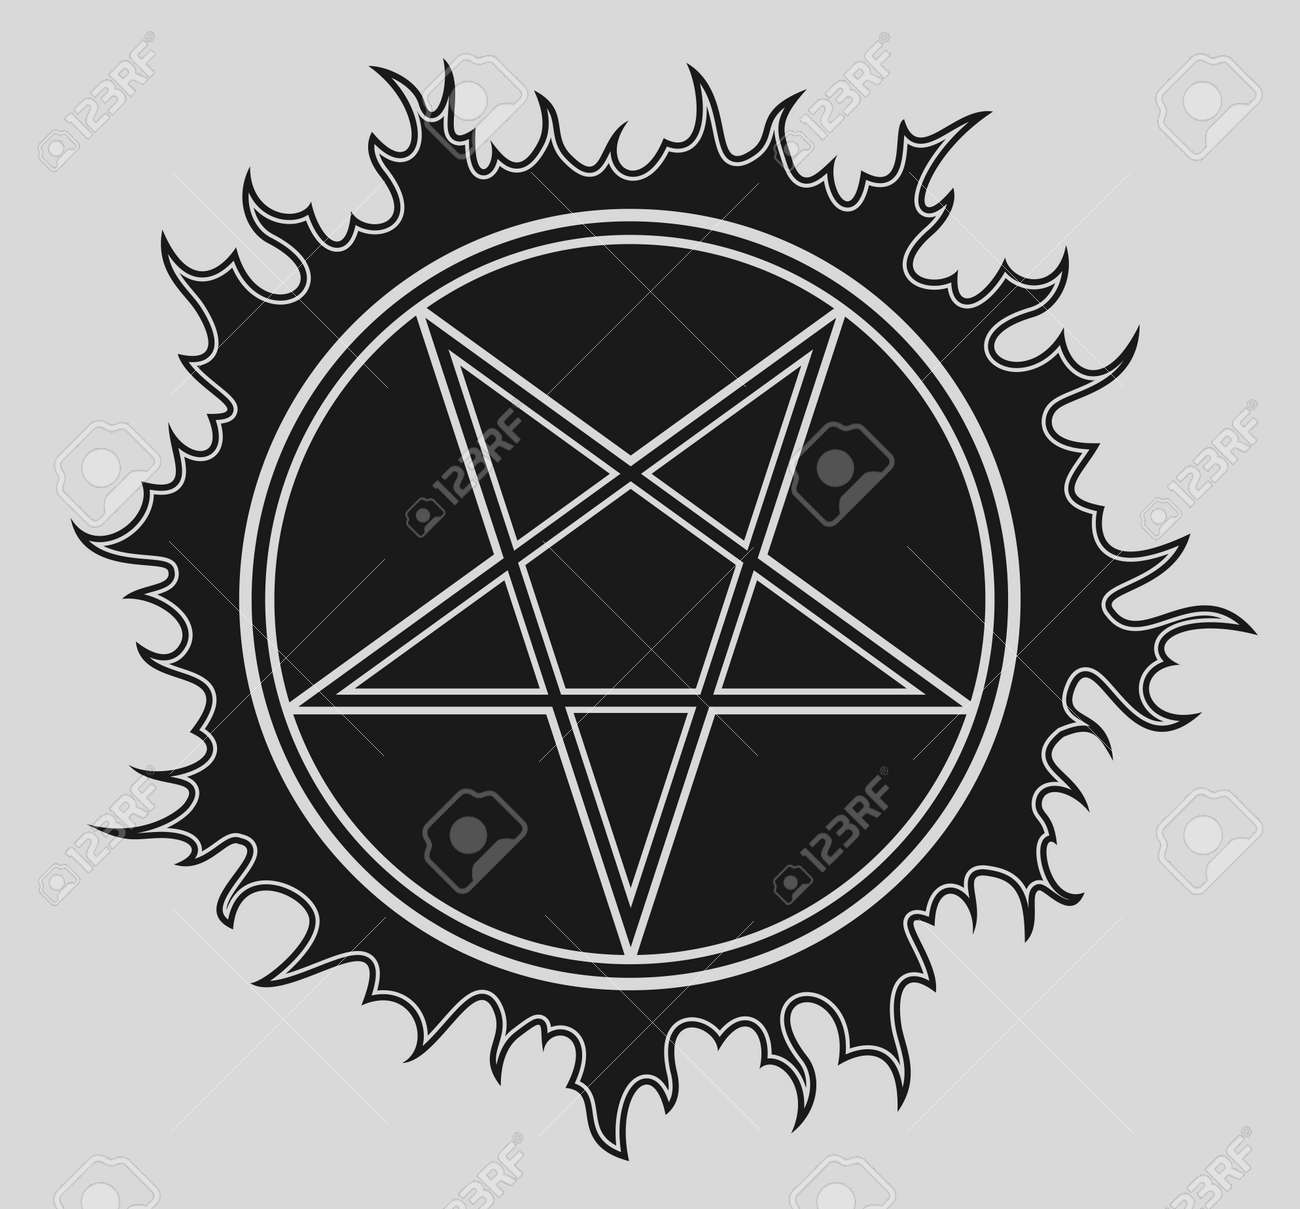 Pentagram vector icon on black star - 156464005